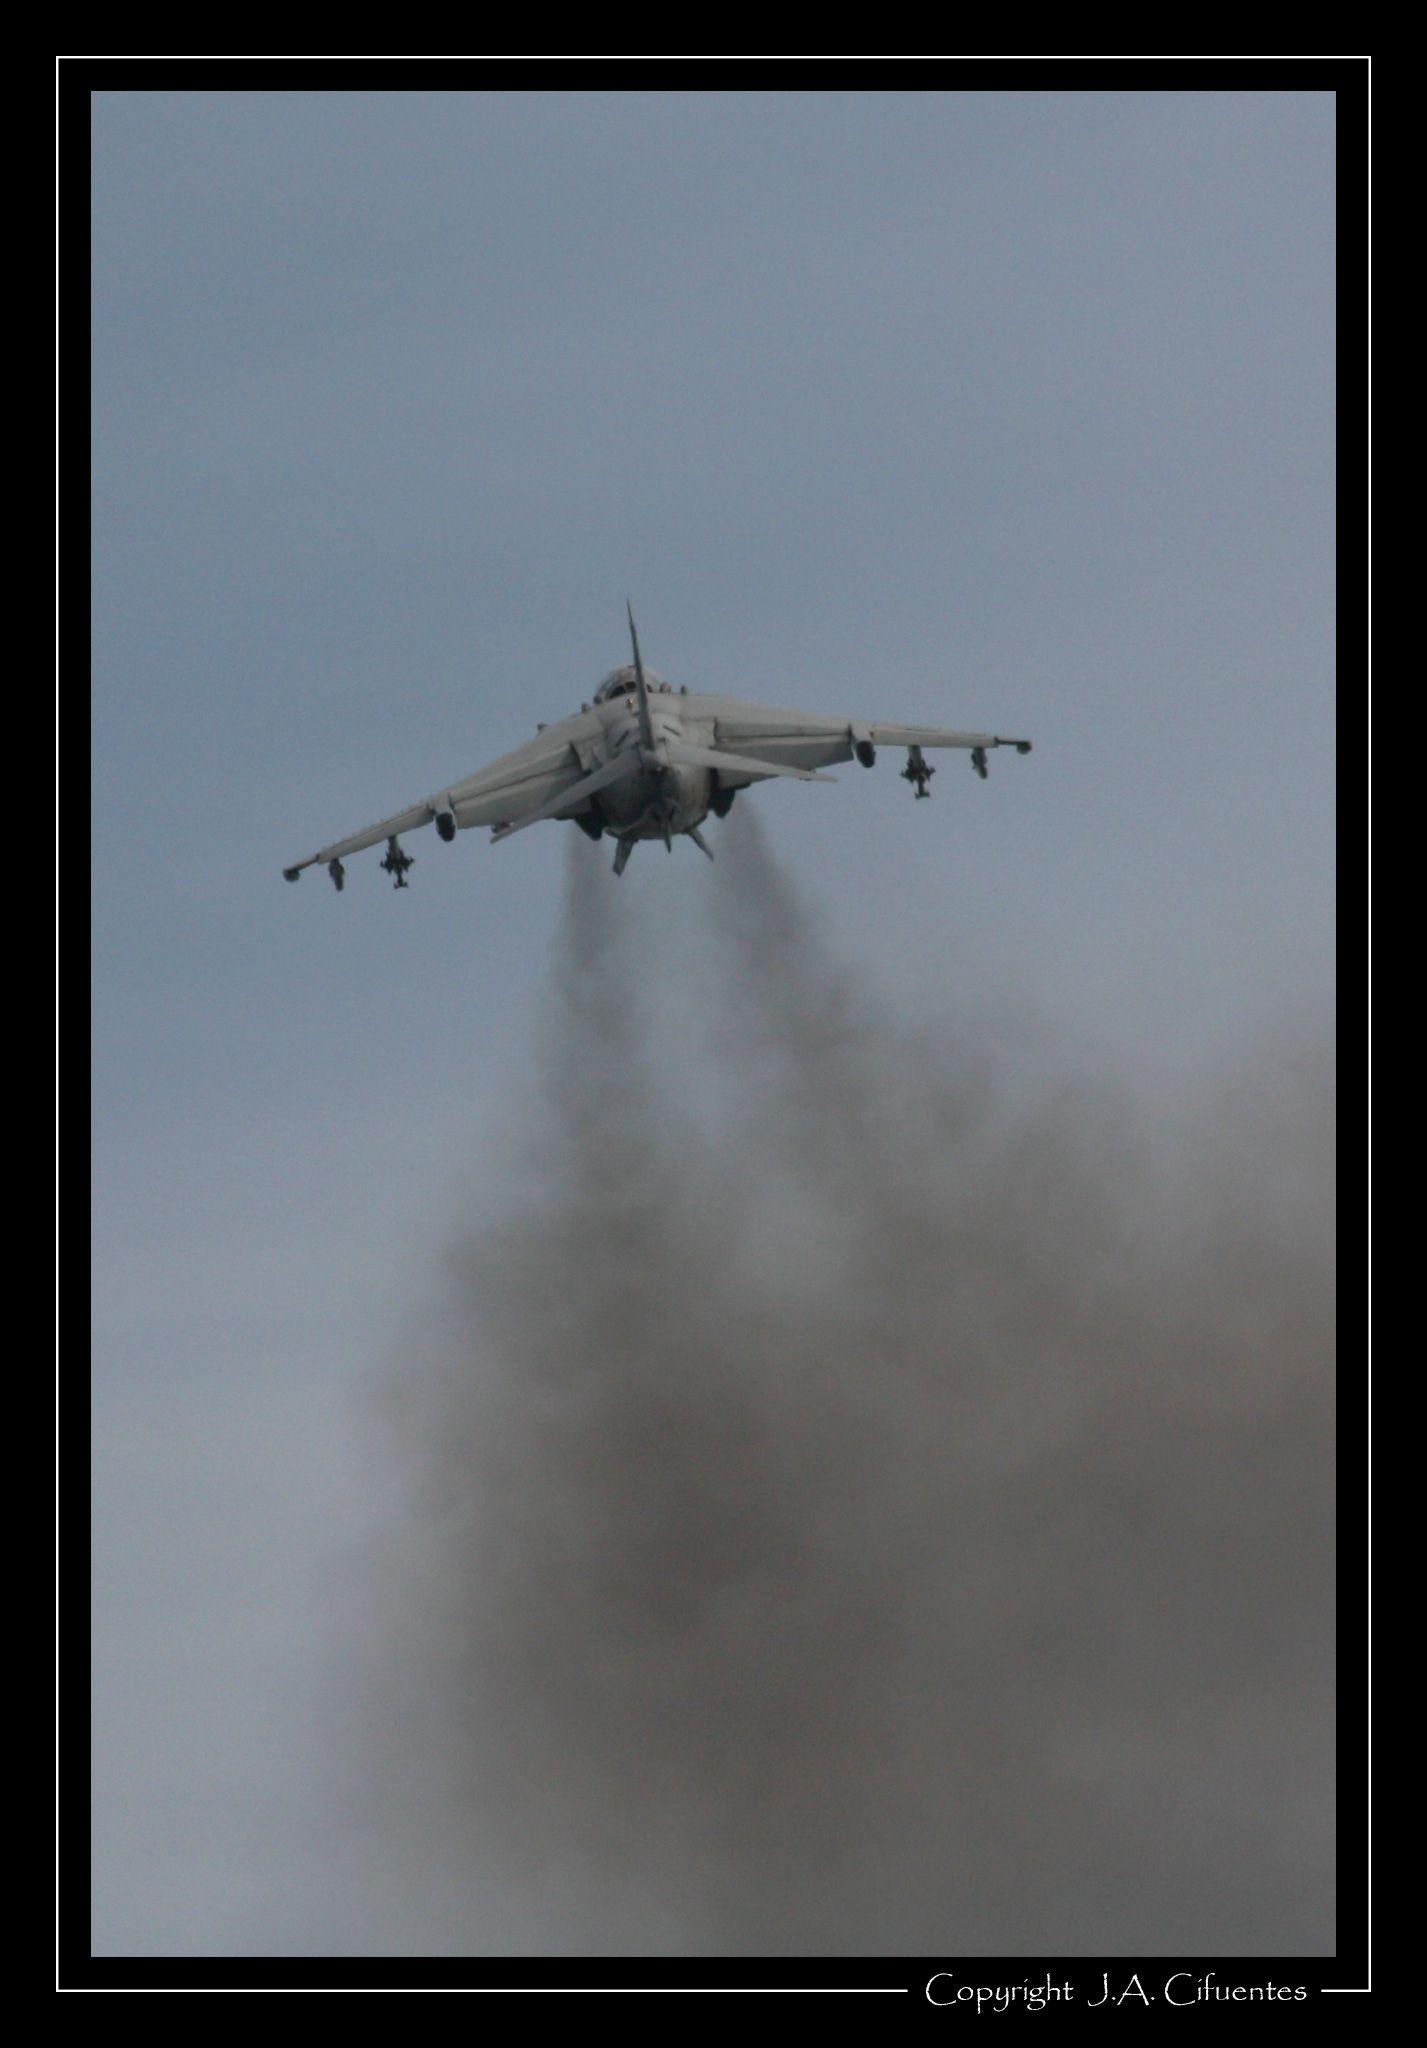 McDonnell Douglas AV-8B Harrier de la Armada.